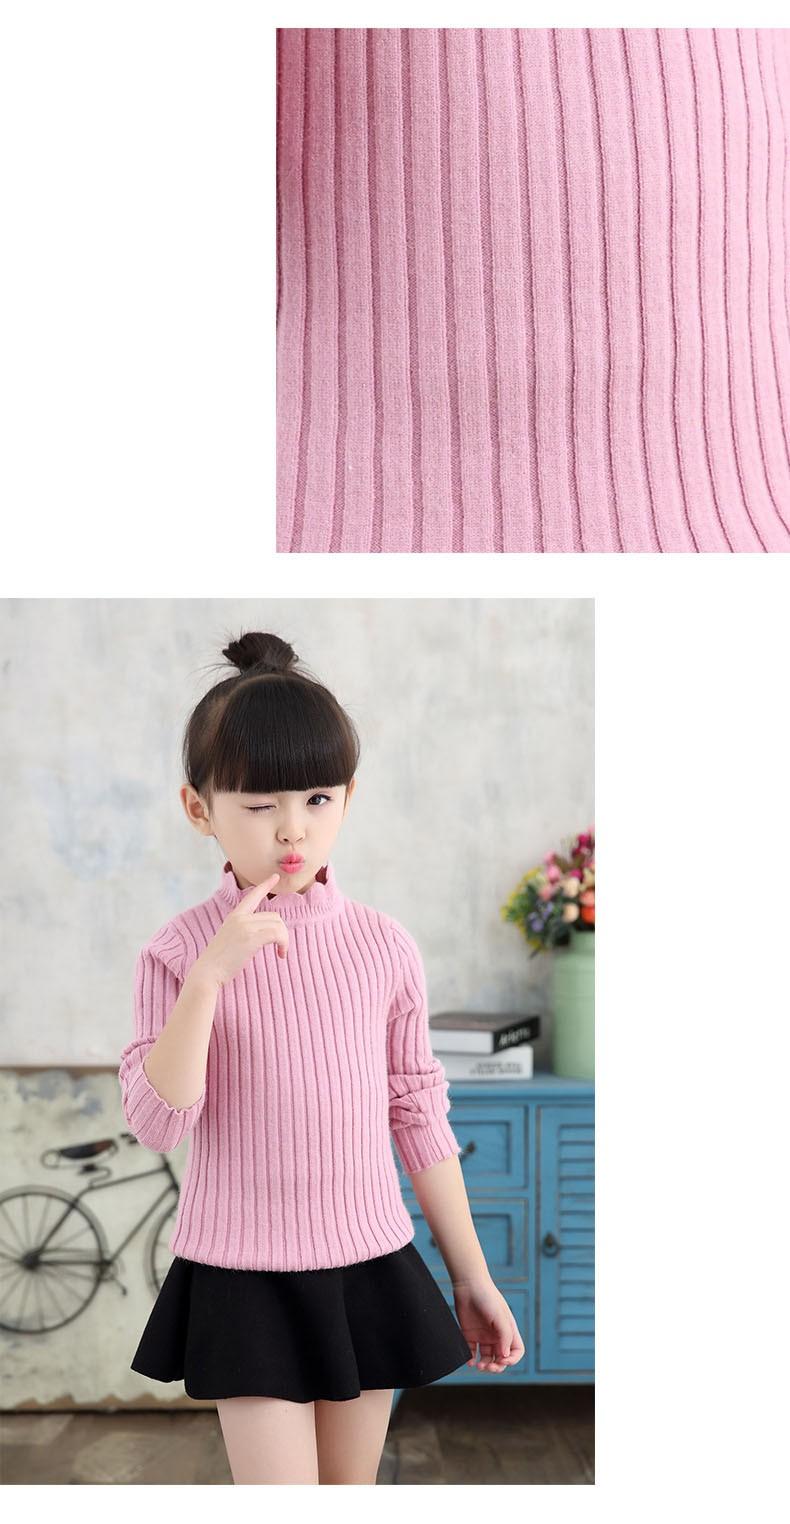 knitting big baby girls sweaters kids winter sweater 2016 long sleeve tops knitted kids sweaters girls pink green black kids top (7)